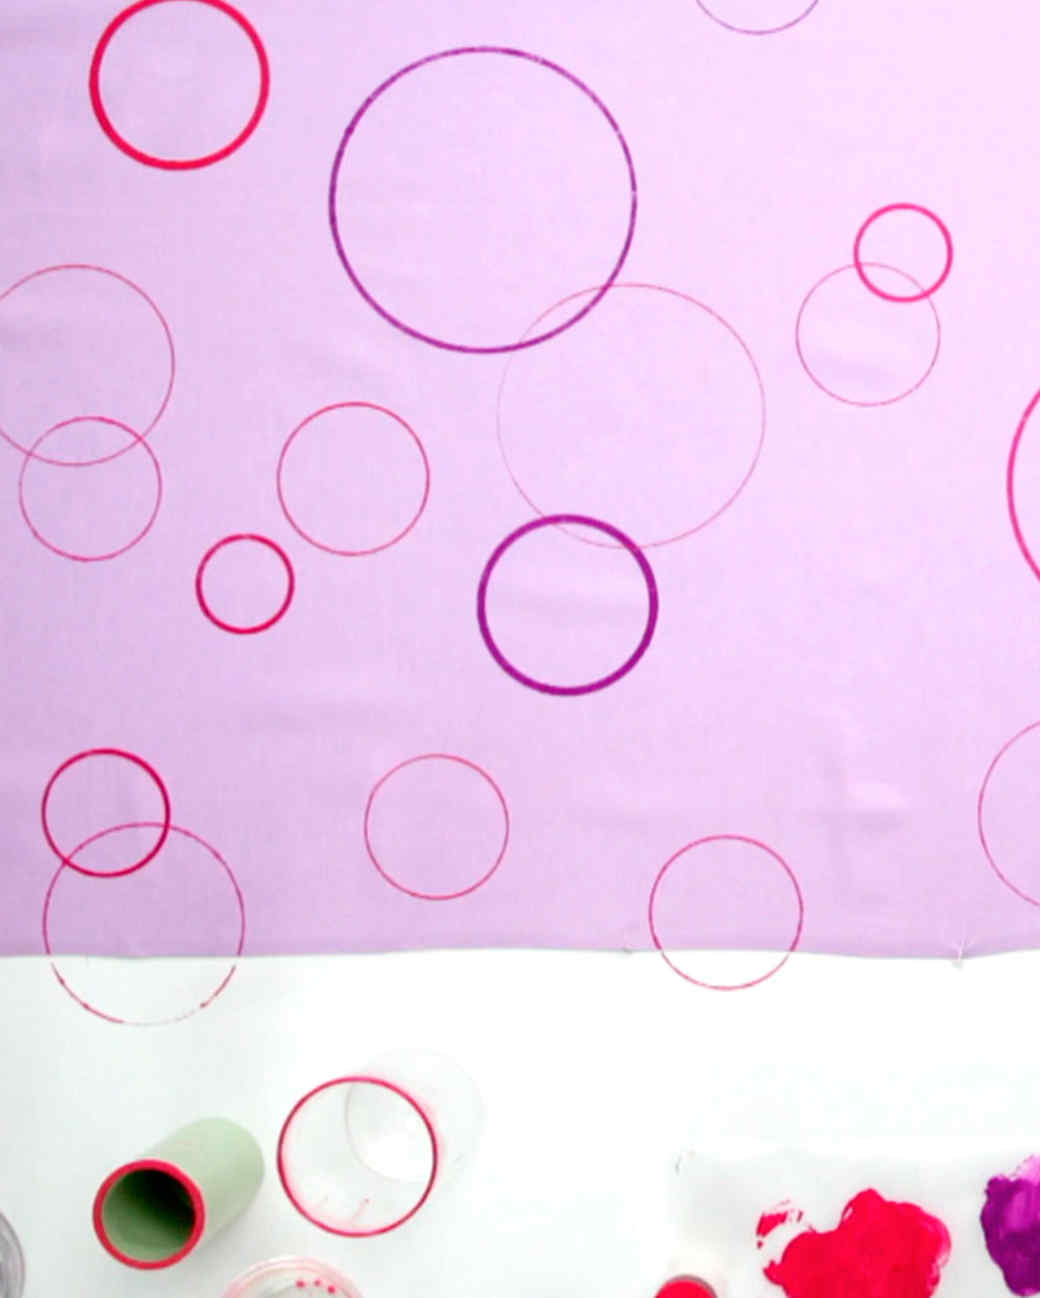 diy-style-erin-furey-diy-foundobjectprinting-craft-5-201508-diy0060.jpg